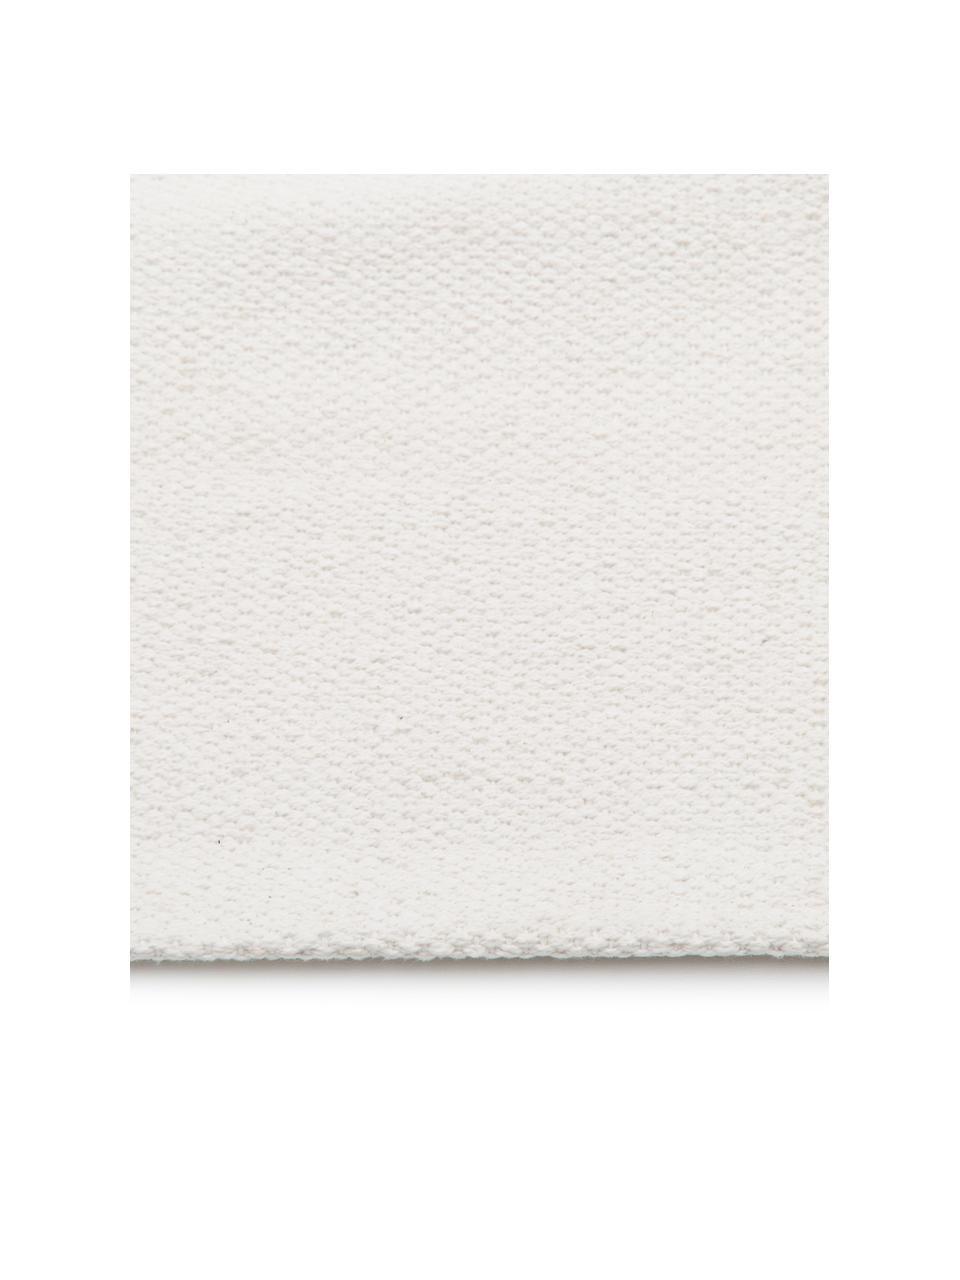 Alfombra artesanal de algodón Agneta, 100%algodón, Blanco crema, An 200 x L 300 cm(Tamaño L)